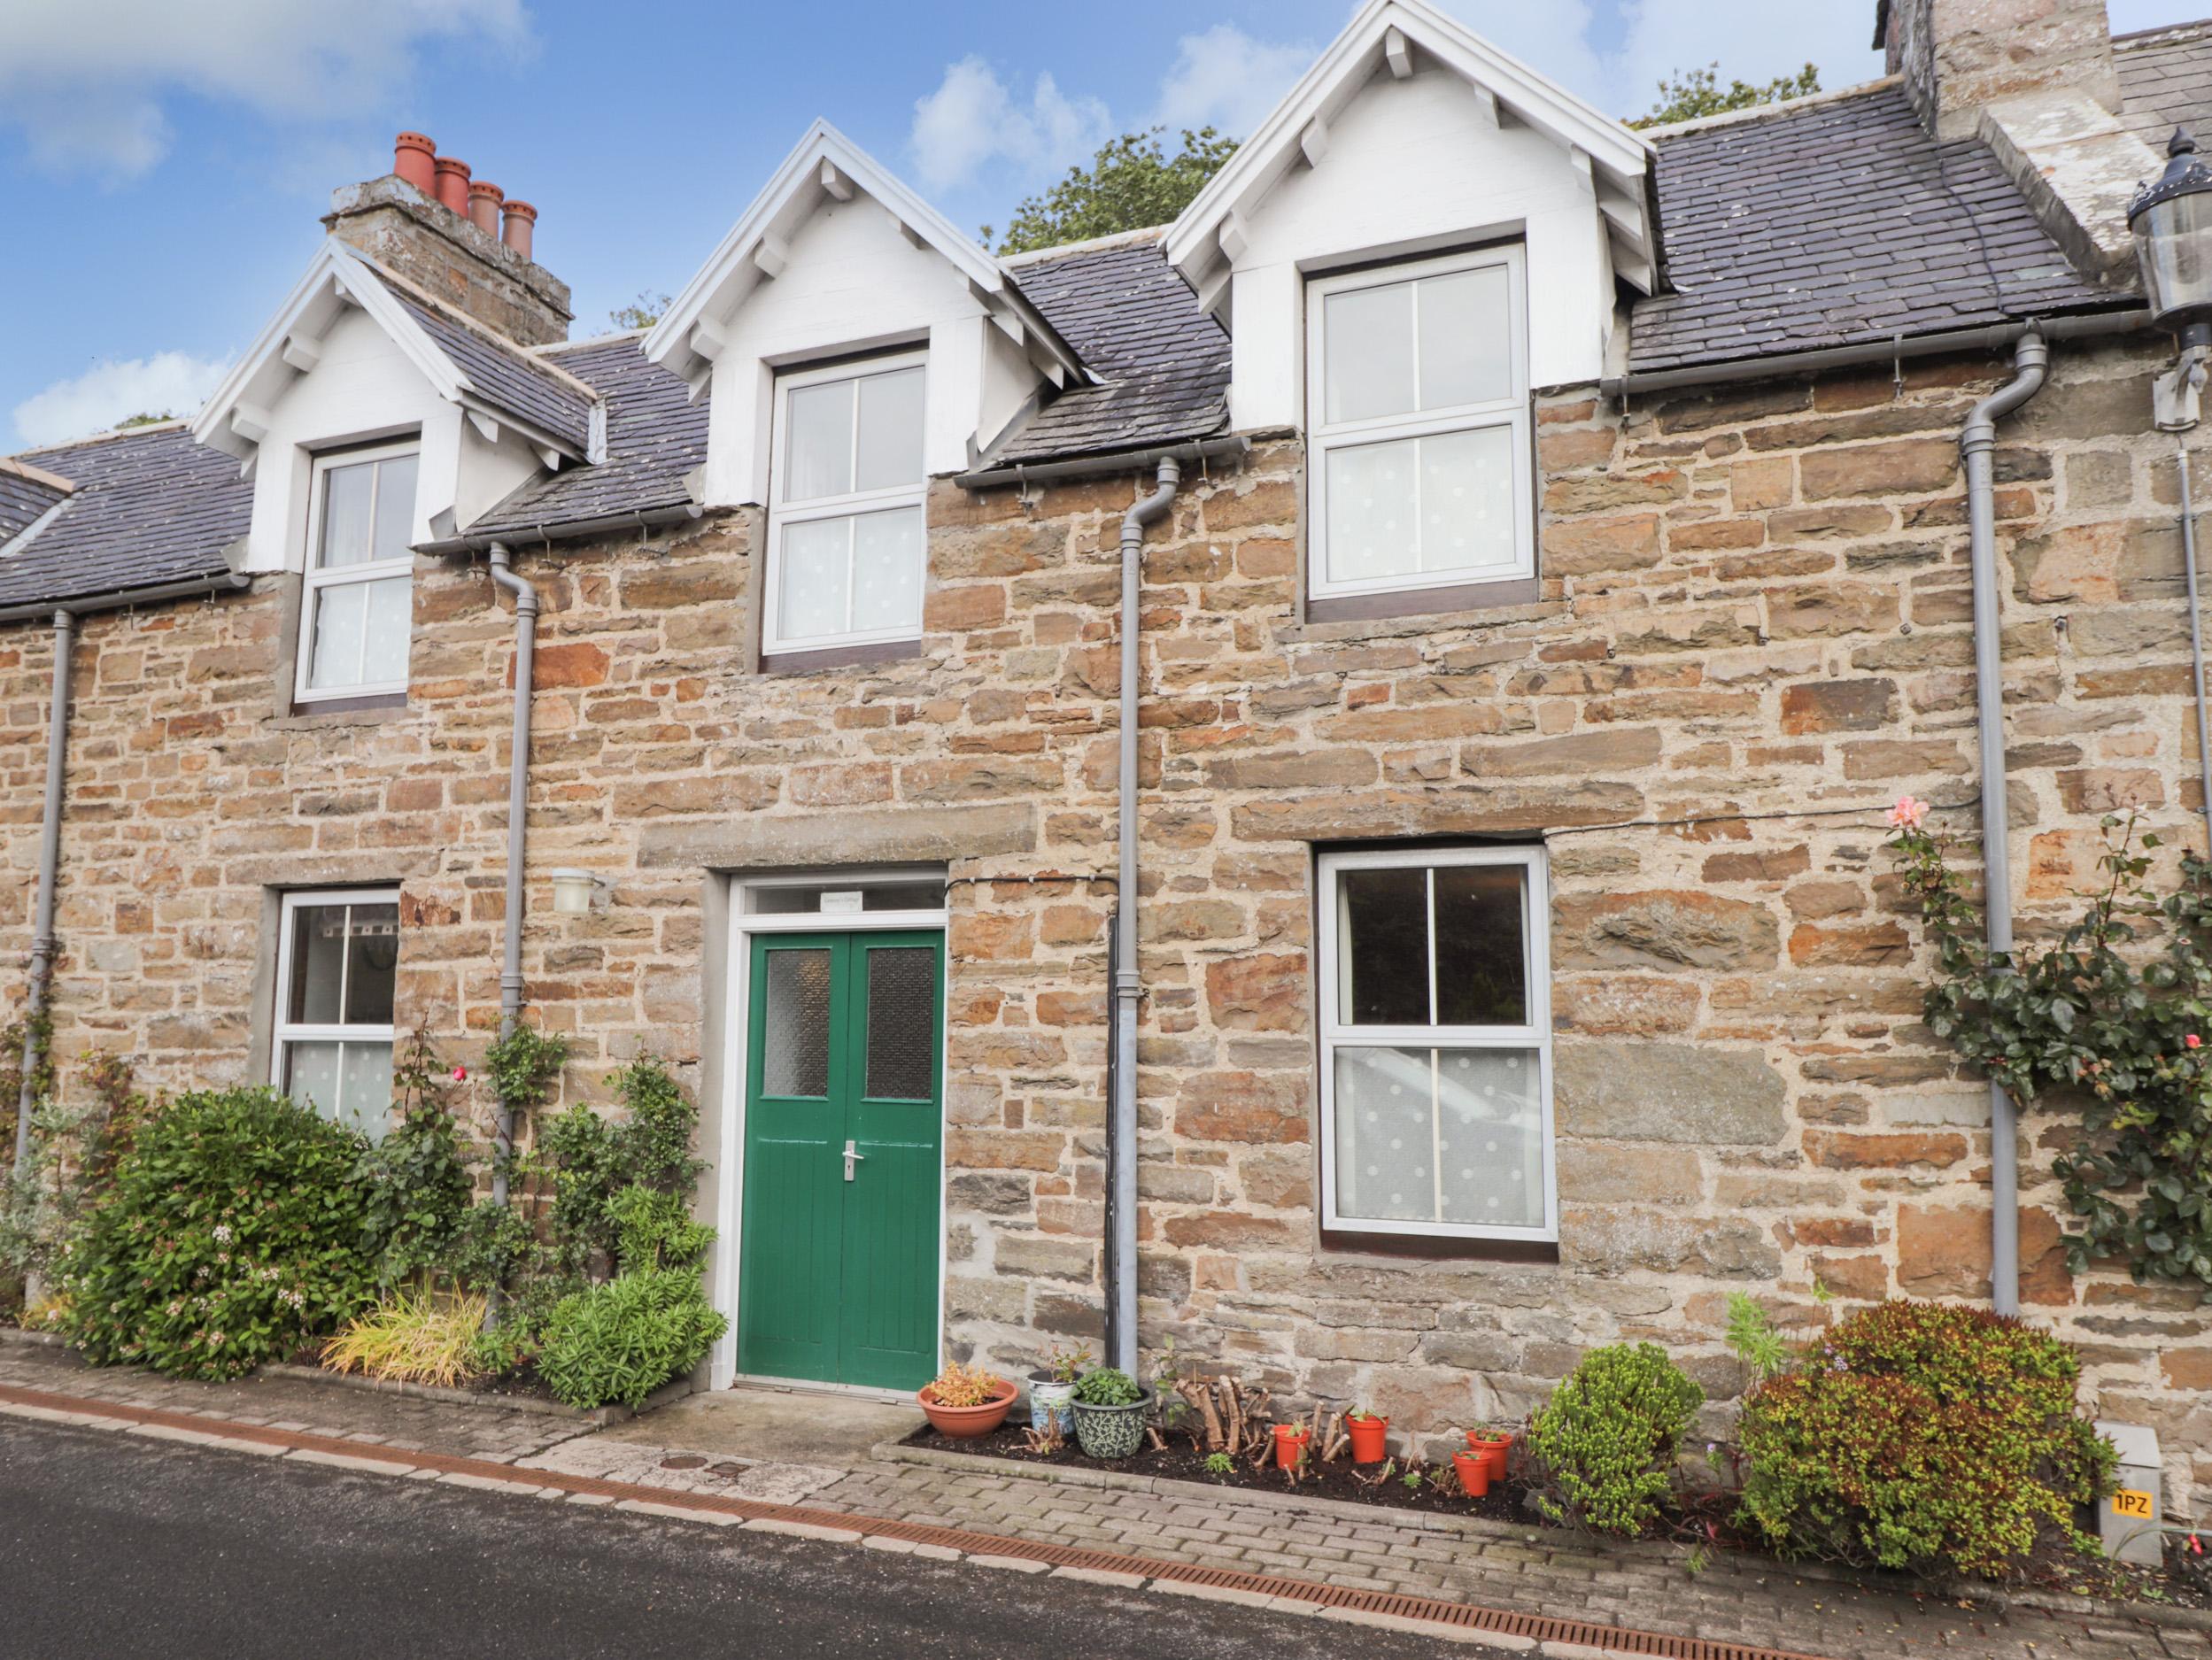 Granny's Cottage, Dunbeath